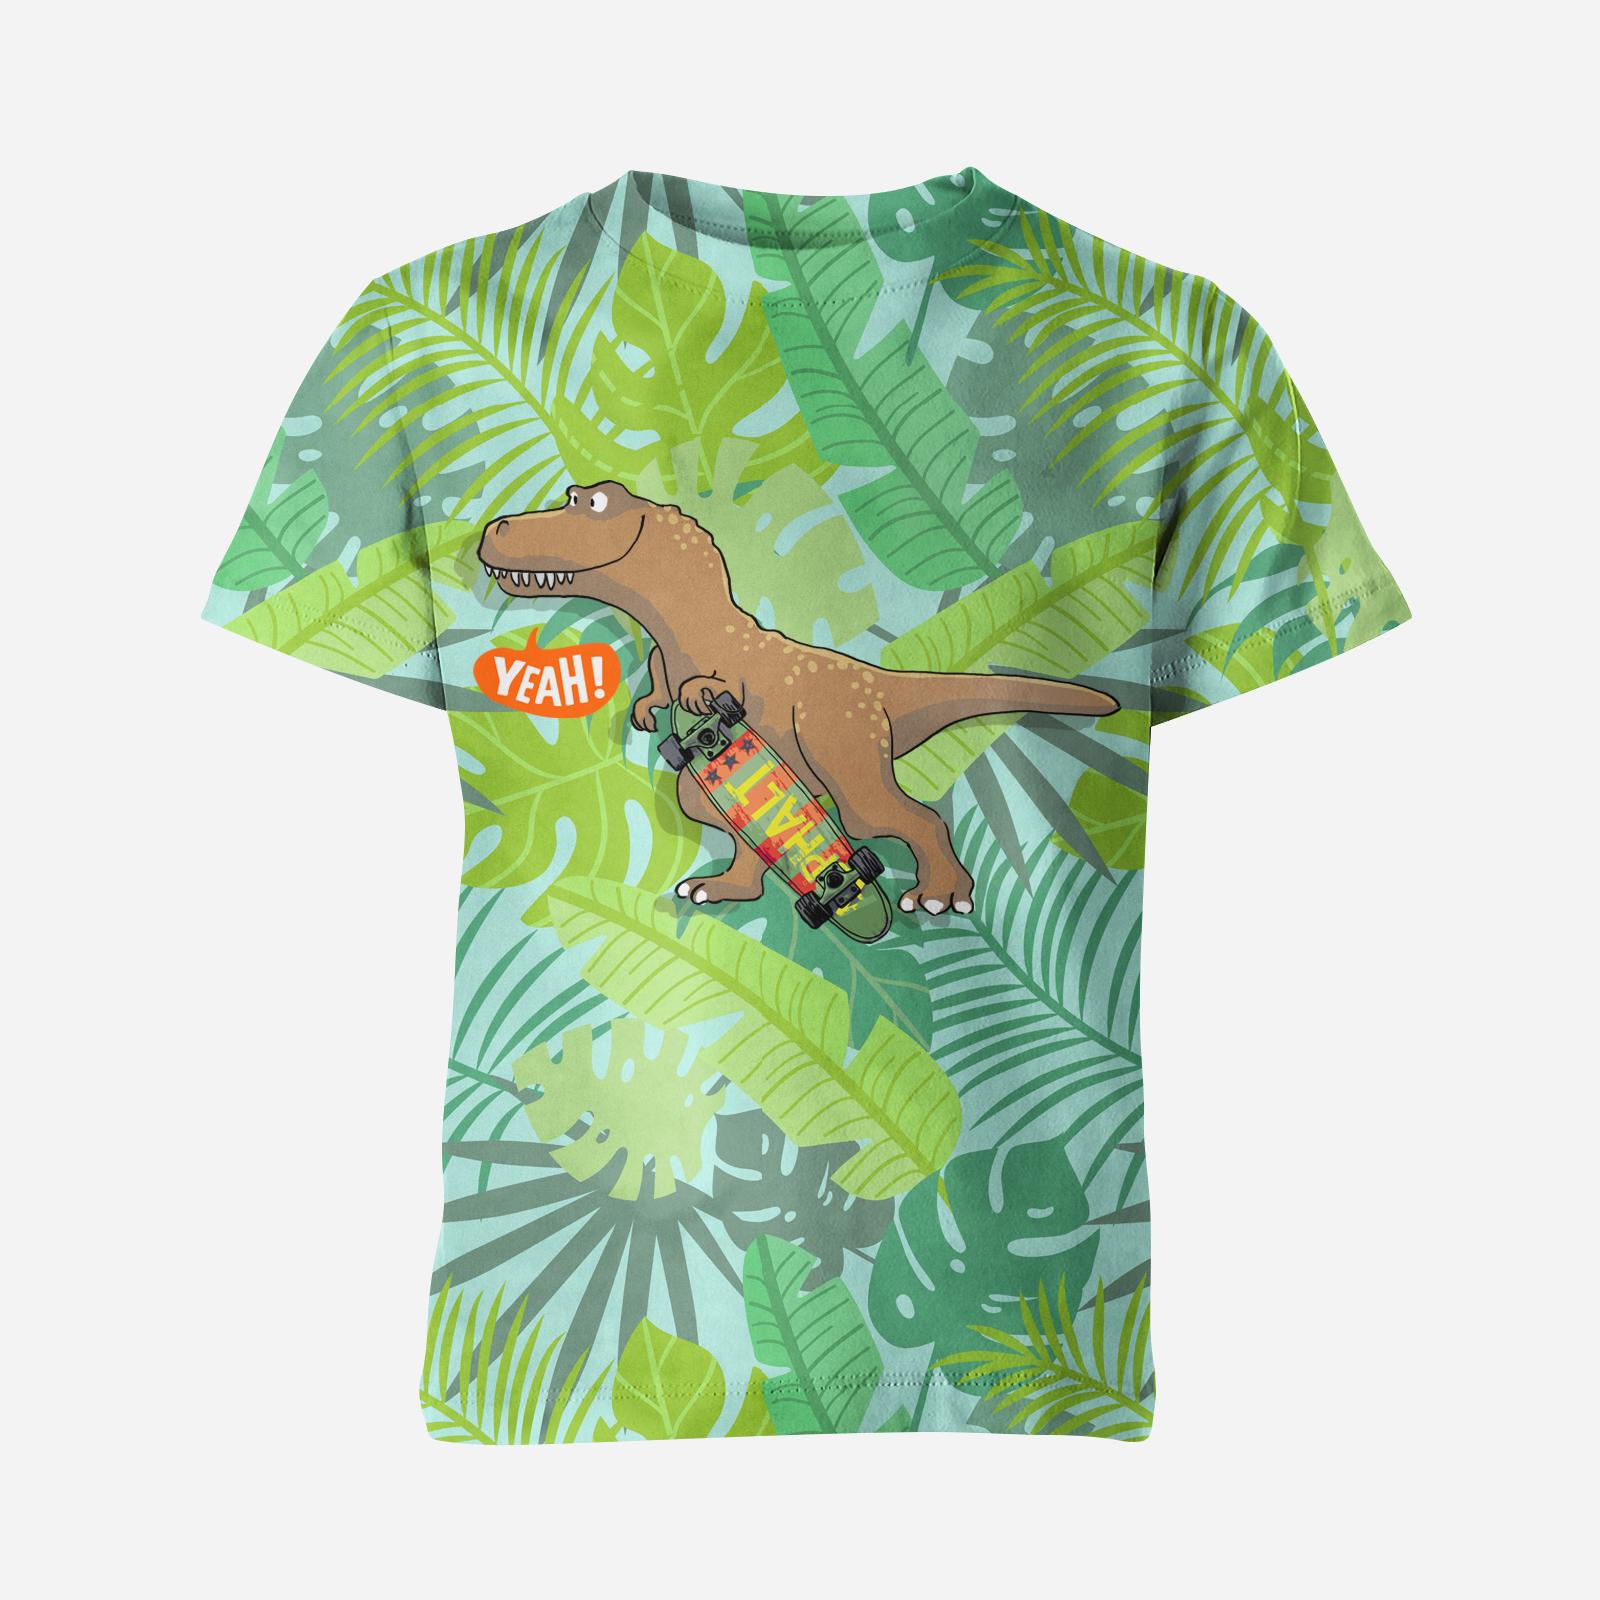 T-Shirt + Motiv FS 20-1.2, A. Kiel